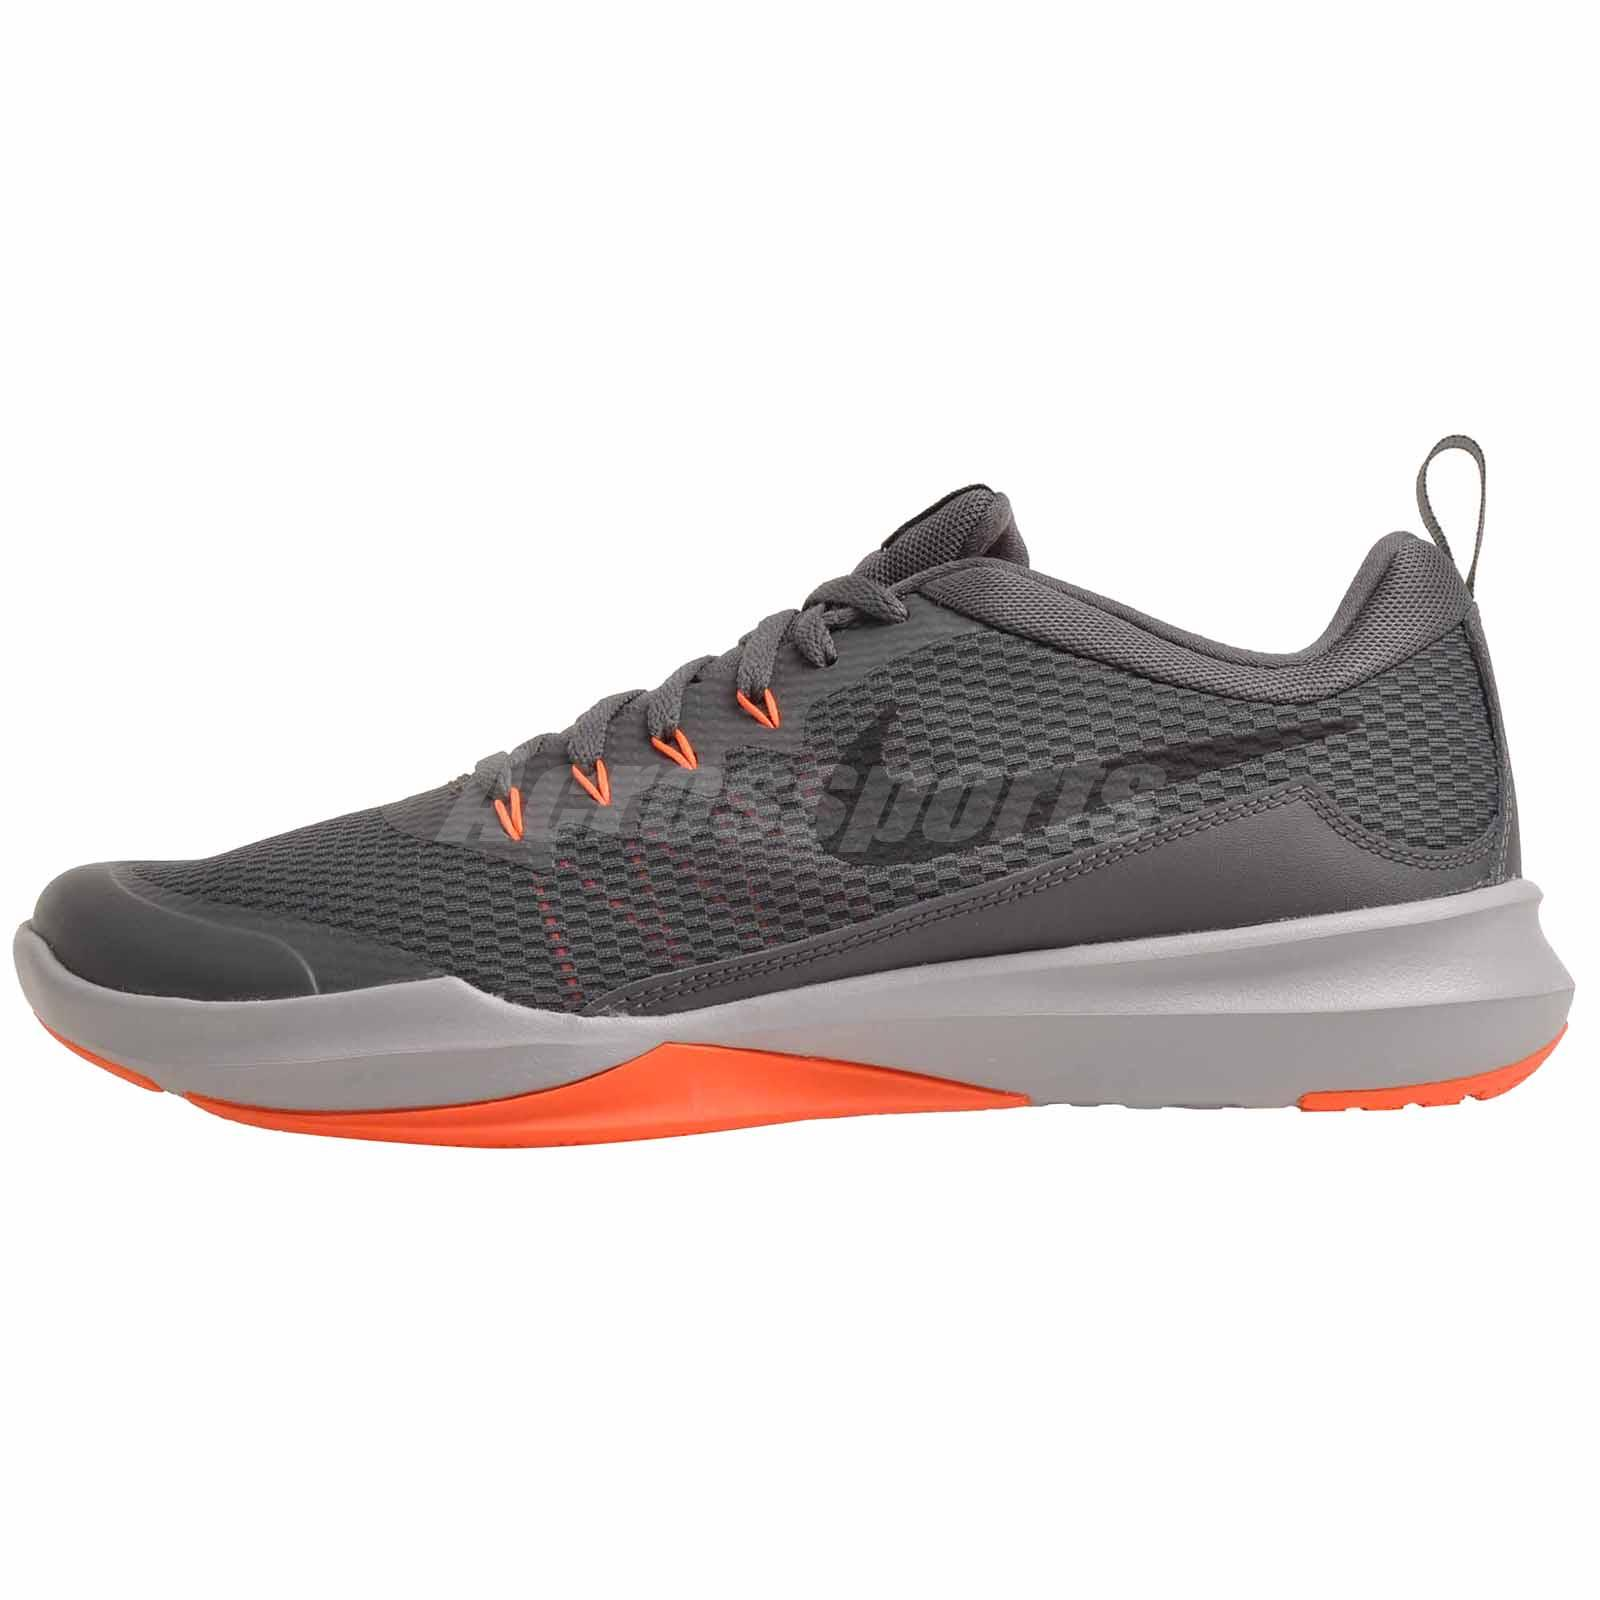 Nike Legend Trainer Cross Training Mens